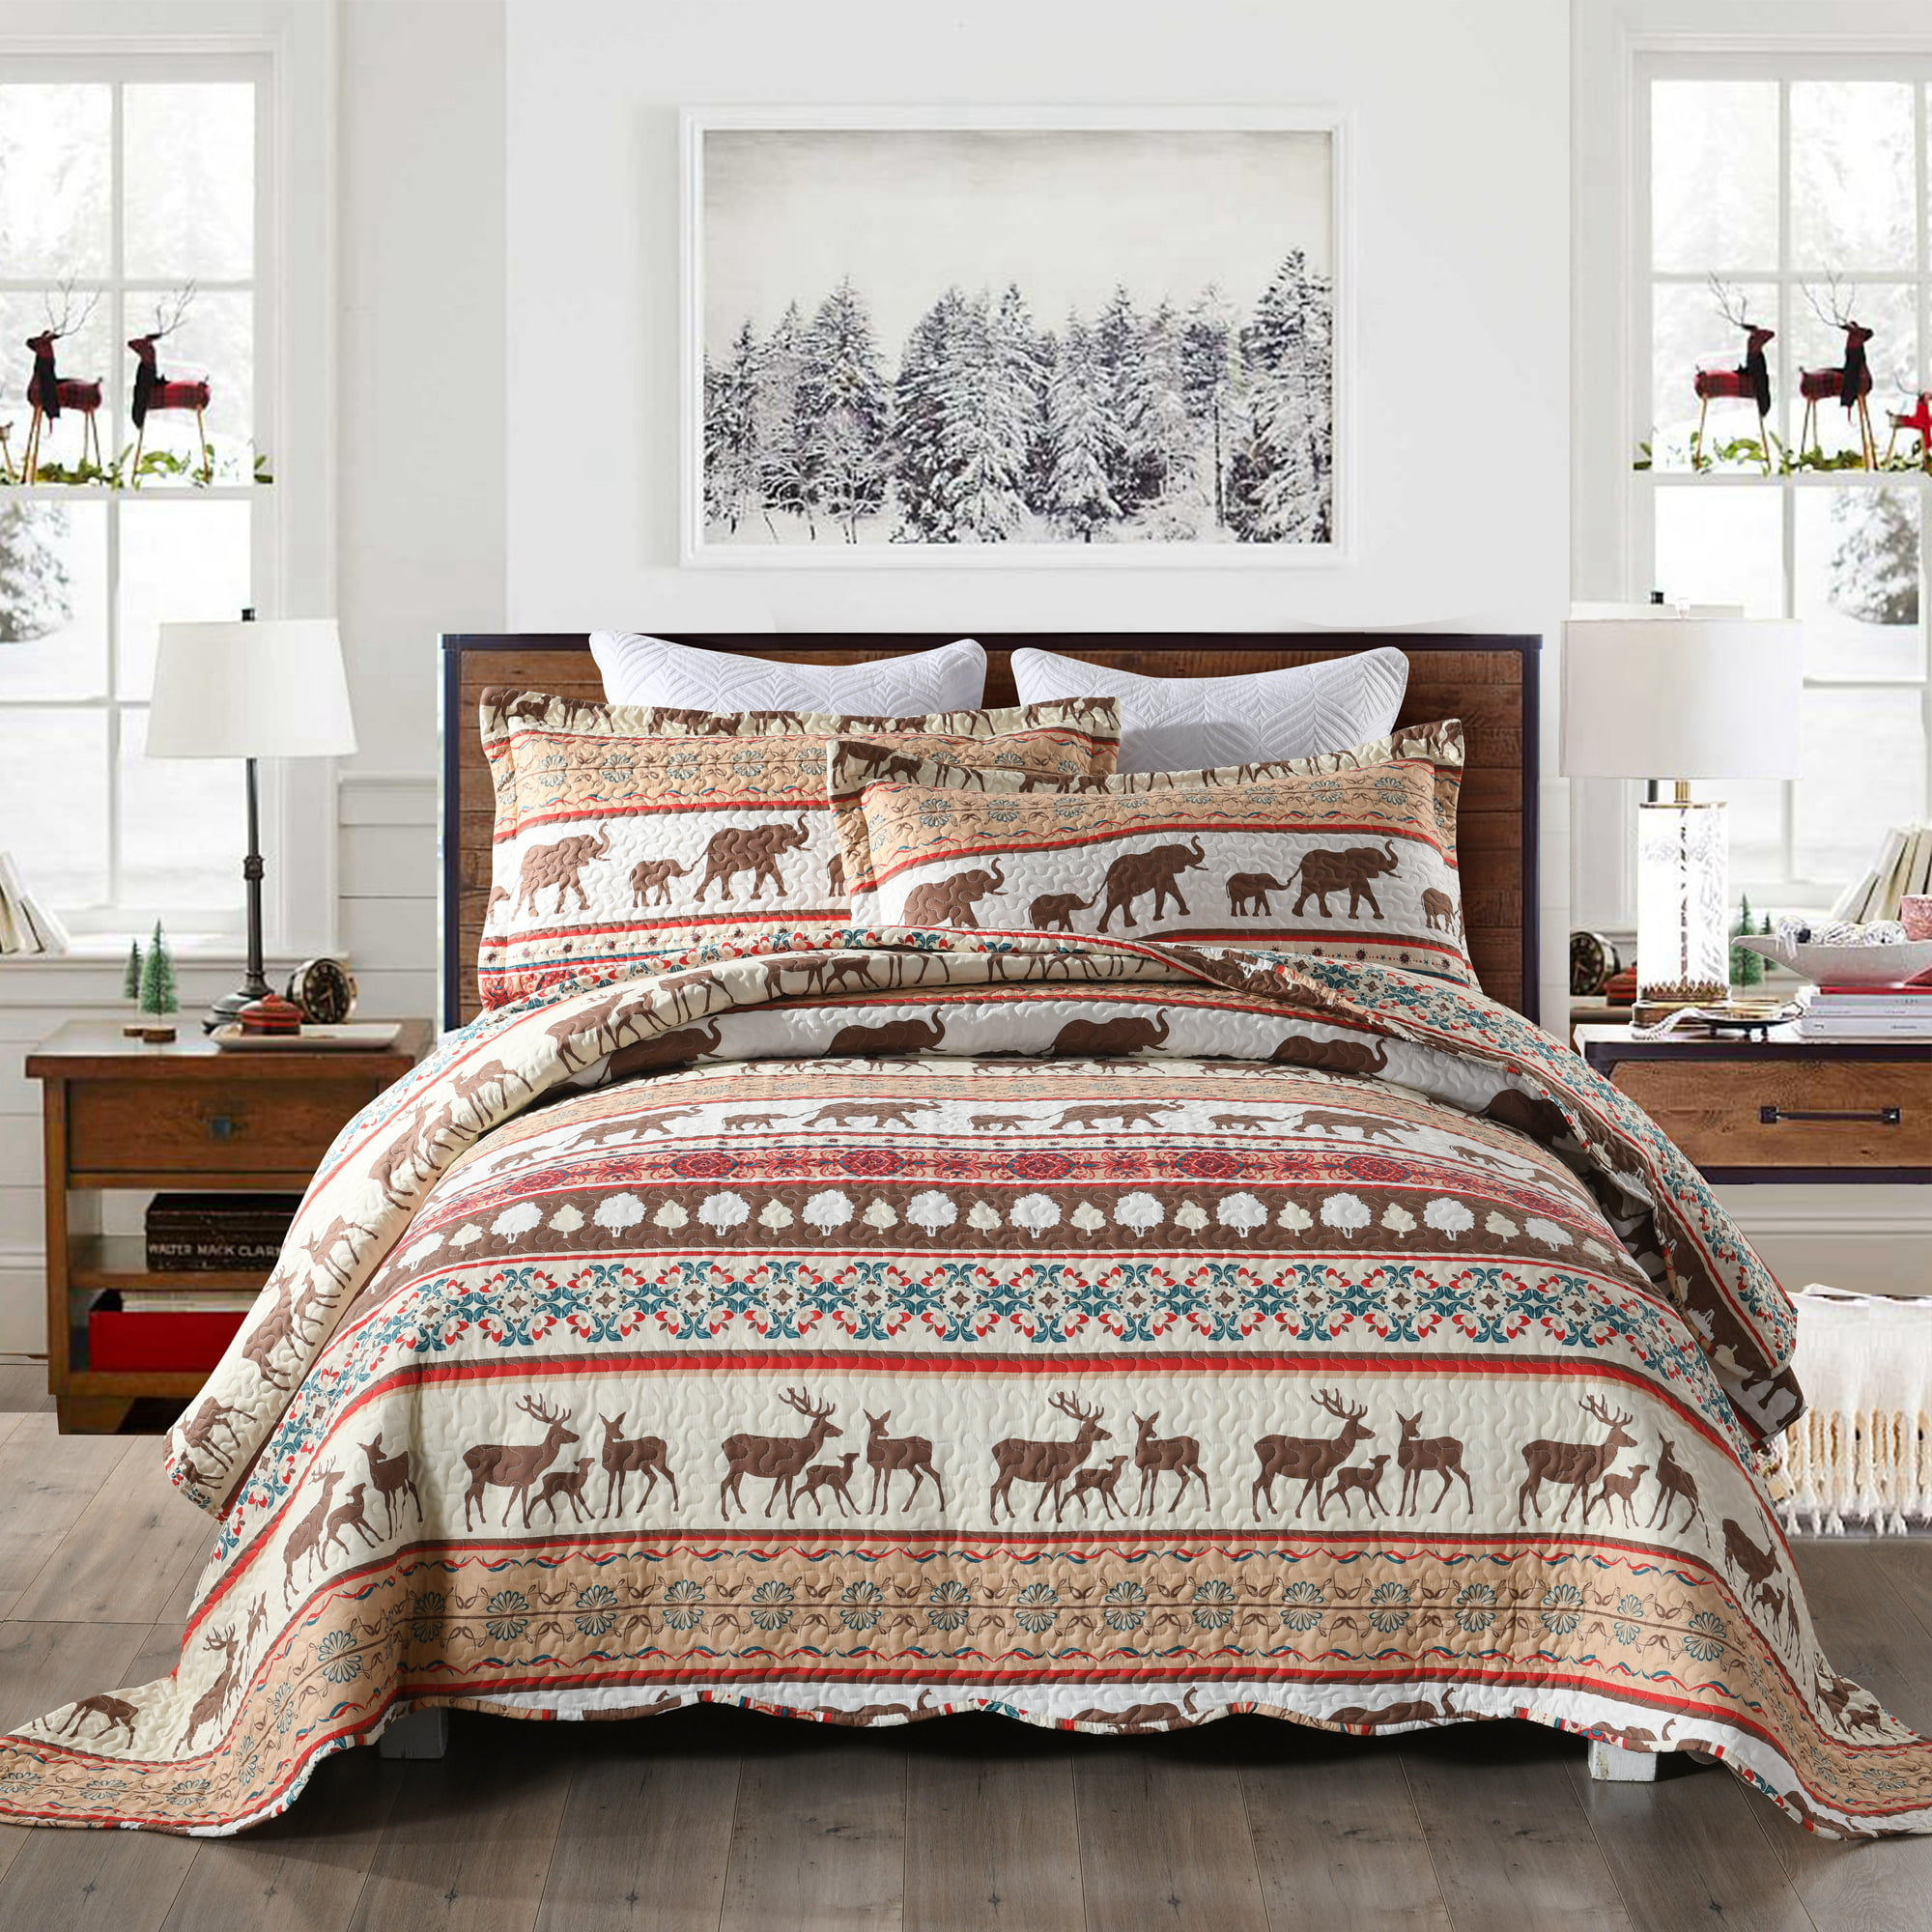 Marcielo 3 Piece Christmas Quilt Set Rustic Lodge Deer Quilt Quilted Bedspread Printed Quilt Bedding Throw Blanket Coverlet Lightweight Bedspread Queen Size By008 Walmart Com Walmart Com